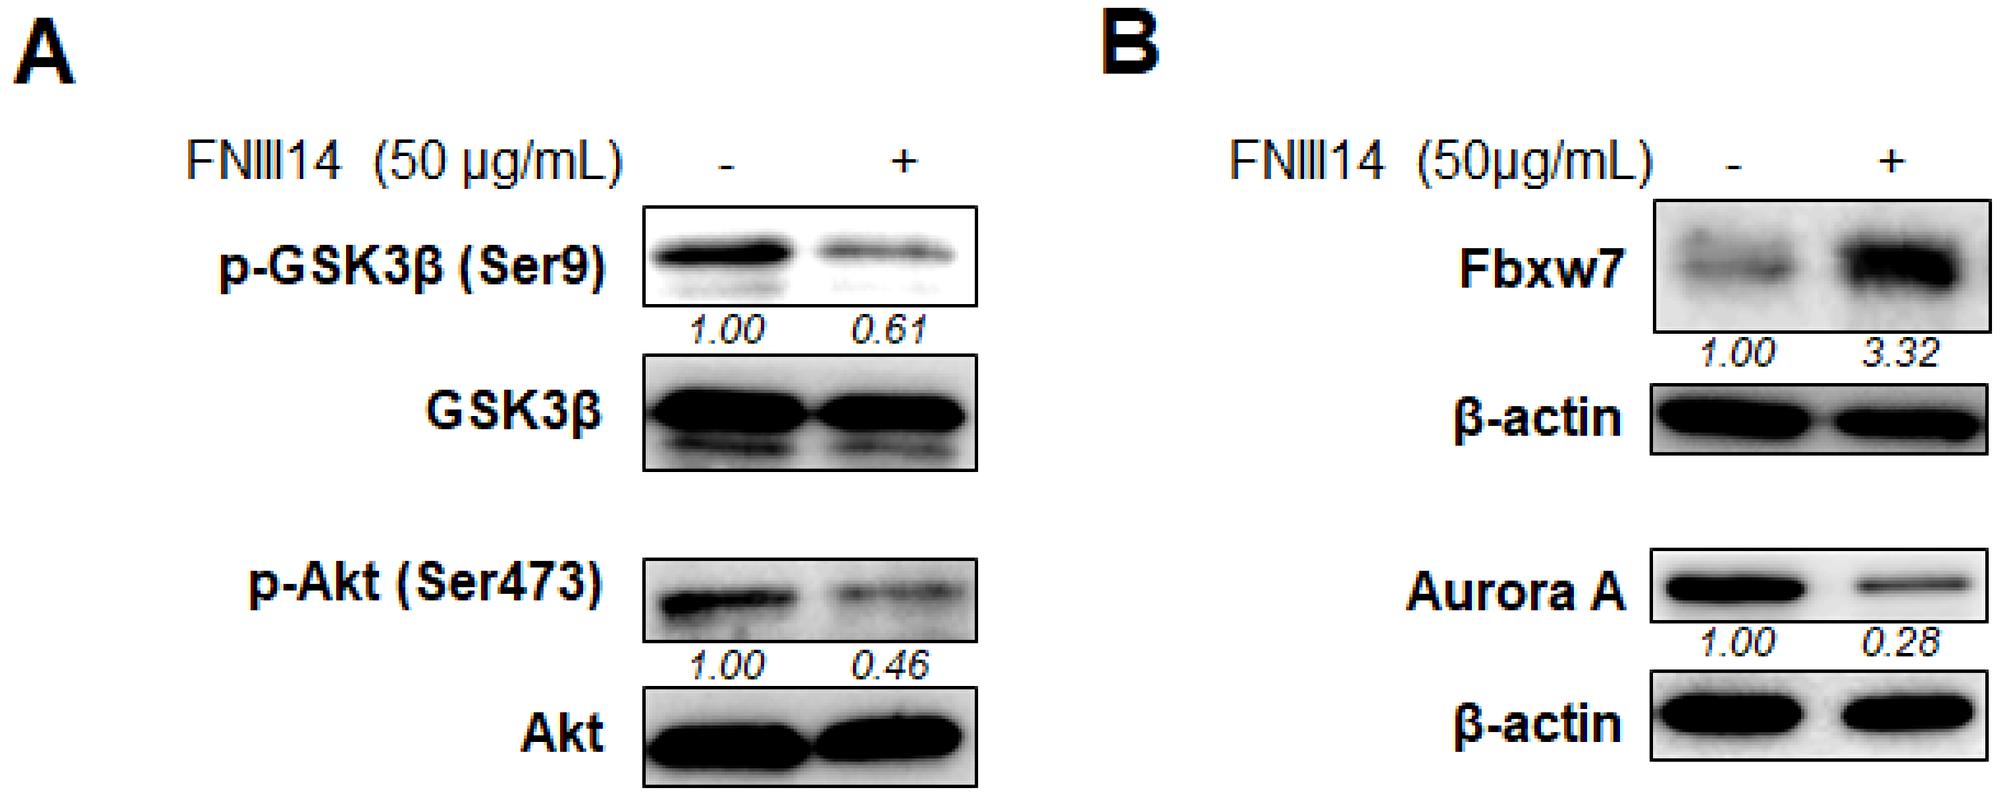 Molecular basis of proteasomal degradation of N-Myc protein induced by FNIII14.